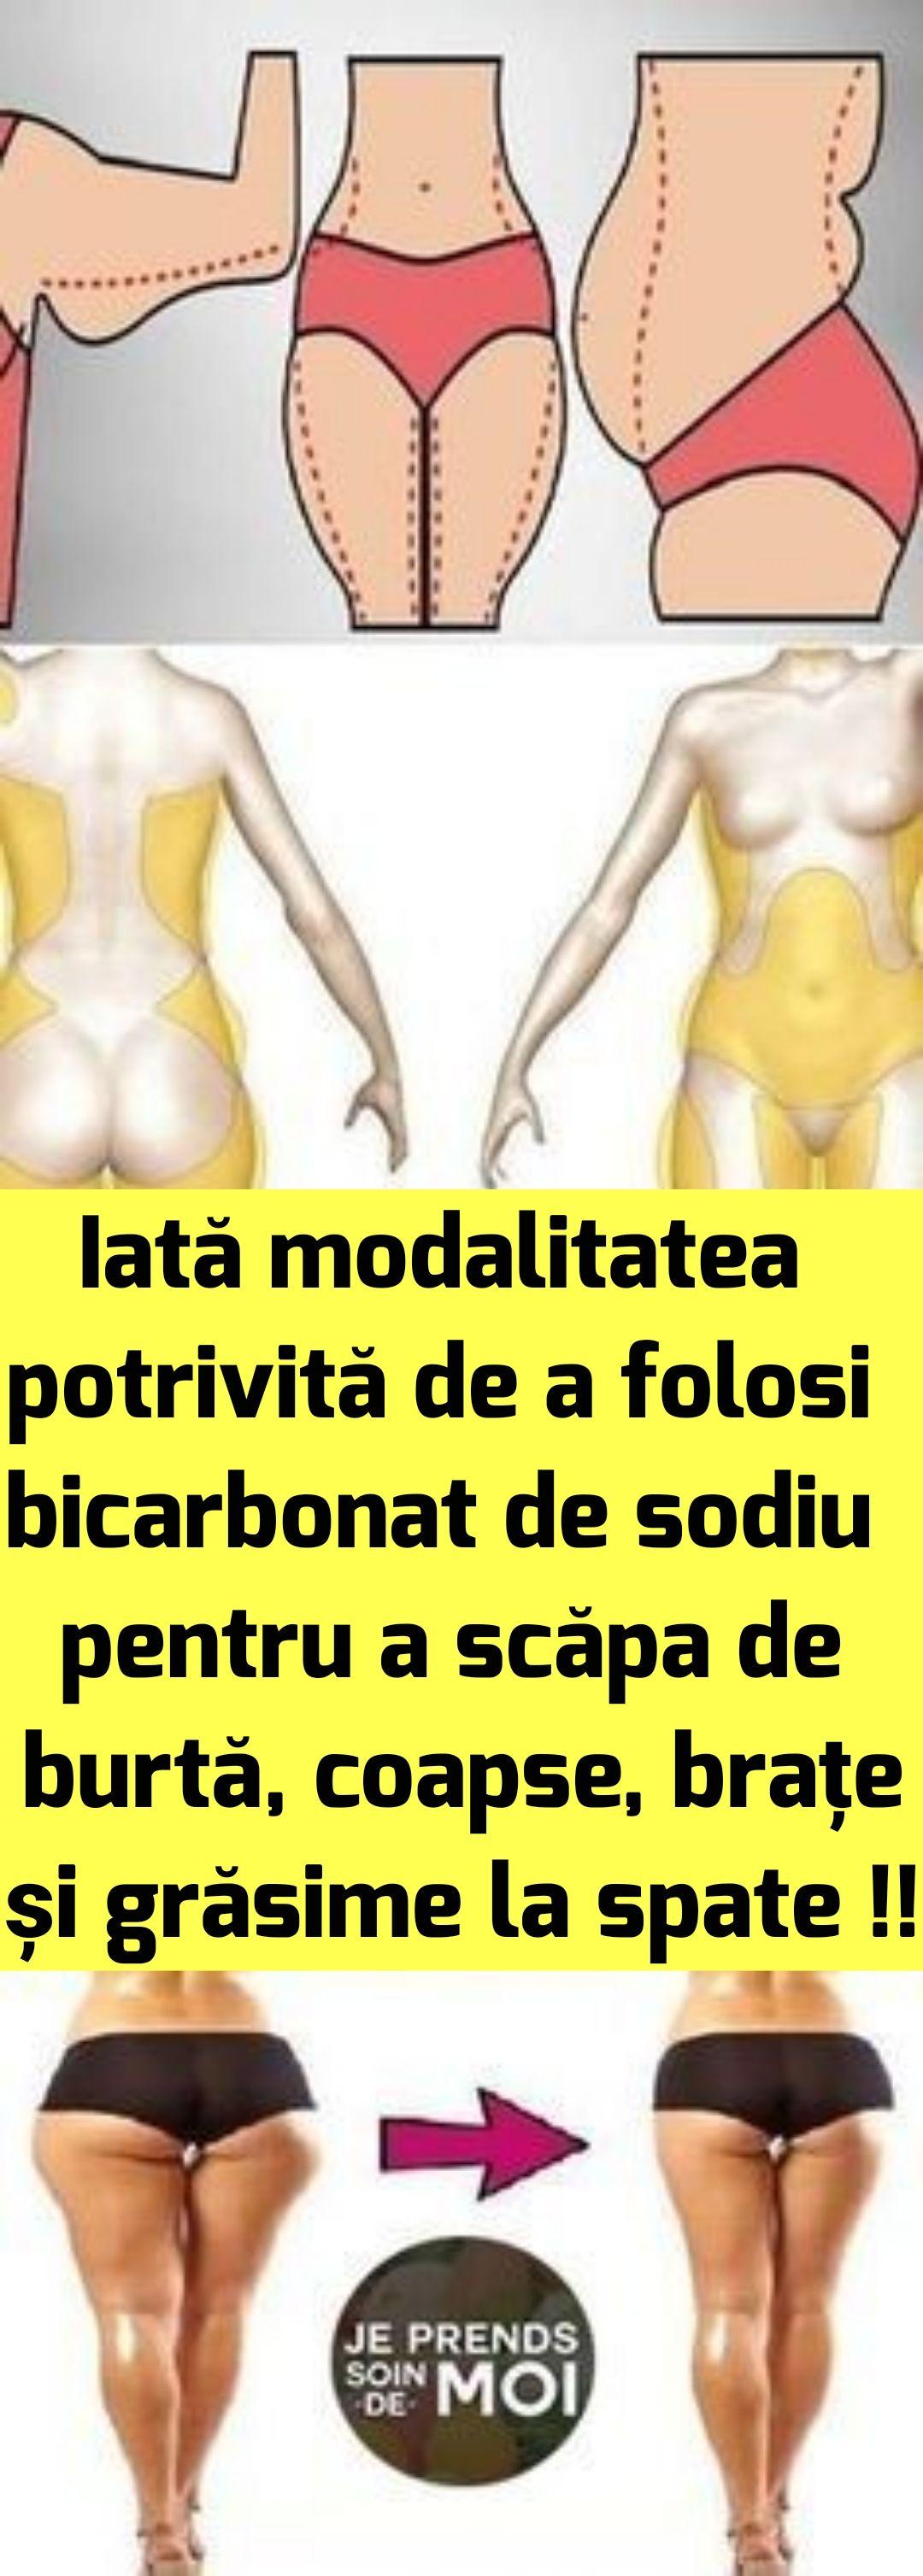 Pierderea de grăsime 4 manechine. Remodelare corporala: scaderea in greutate sau pierdere in cm?